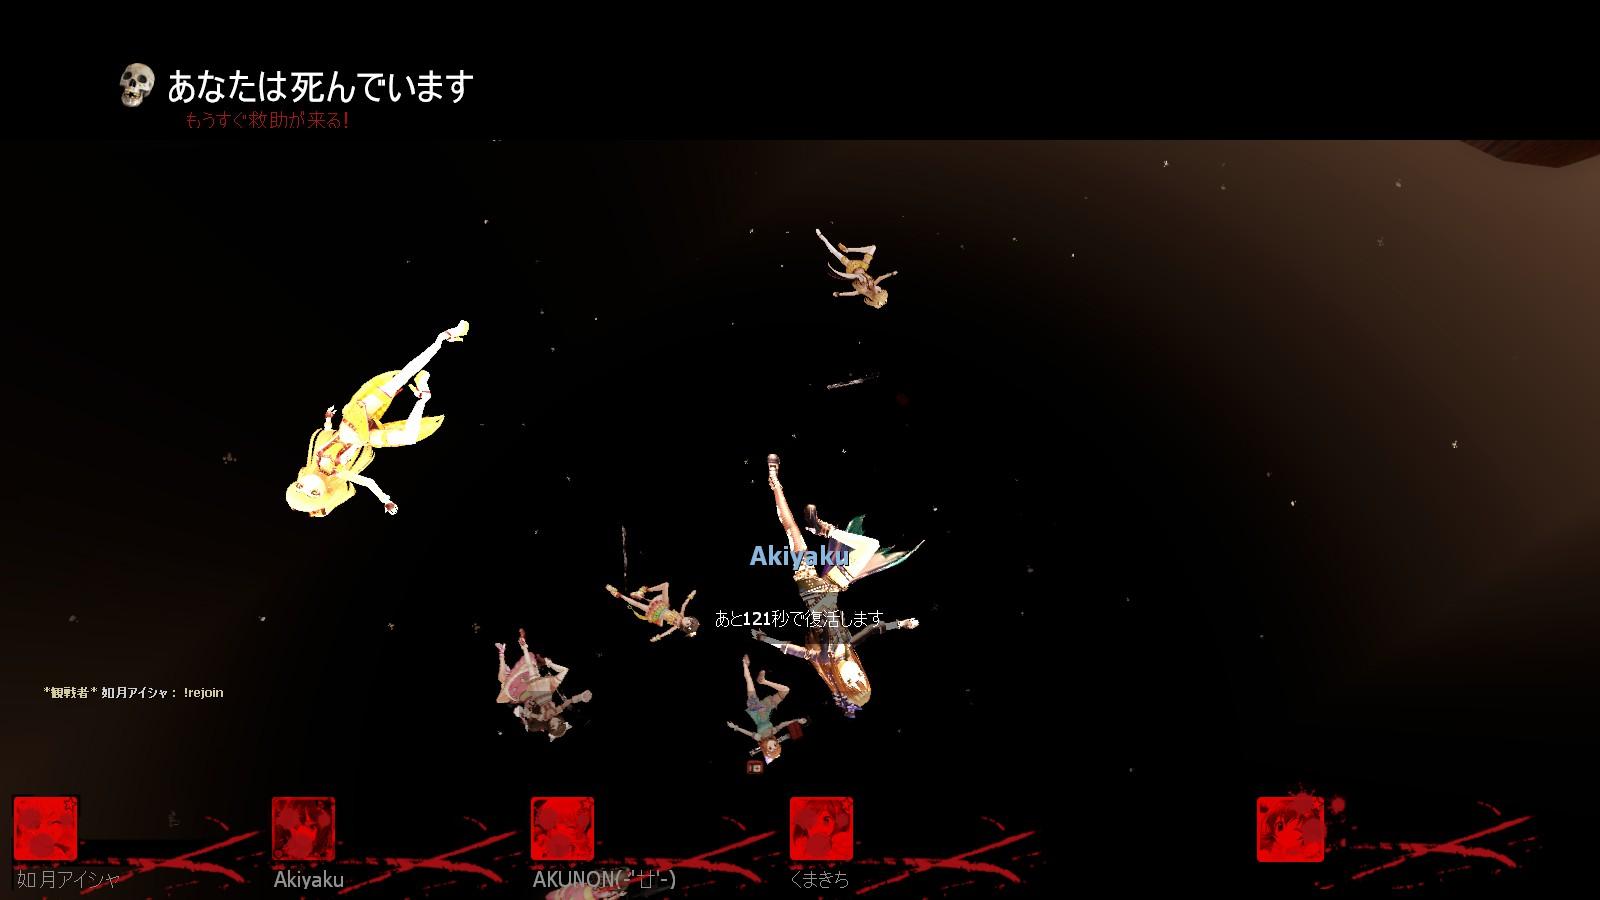 Steam Community Left 4 Dead 2 - Imagez co